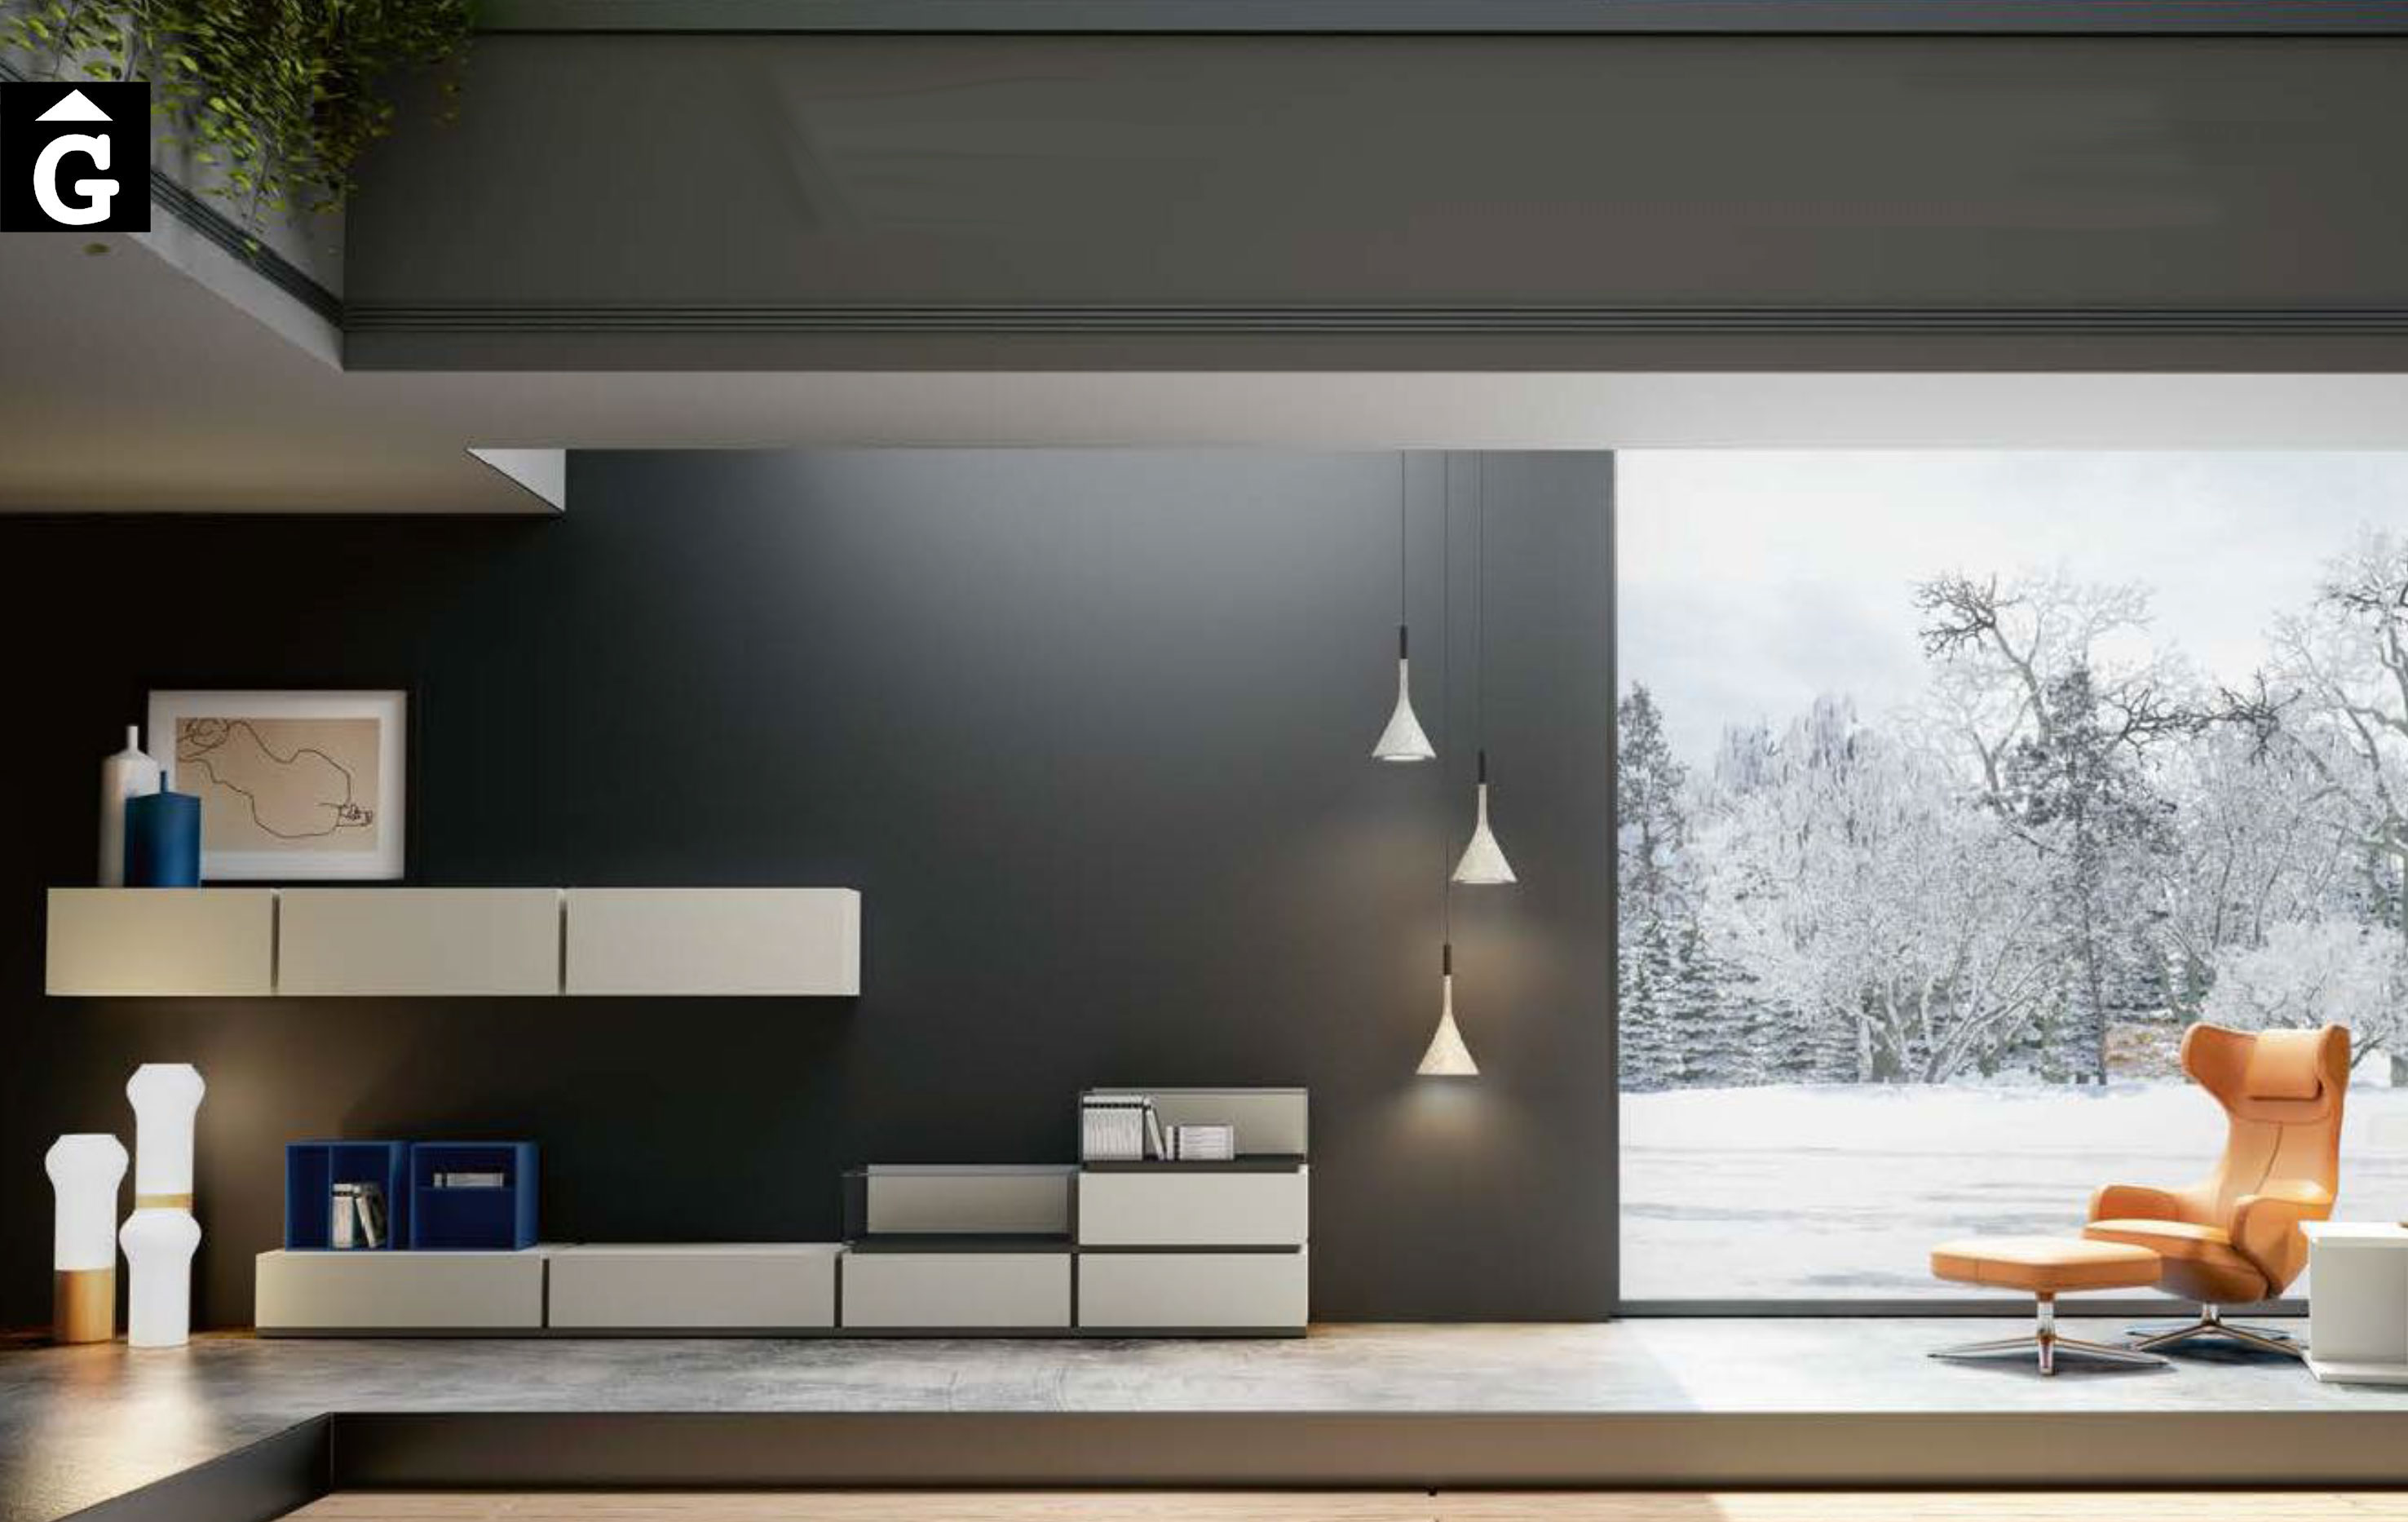 MOBLE-56-CONNECTOR-EMEDE-mobles-by-Mobles-GIFREU-Girona-ESPAI-EMEDE-Epacio-emede-Muebles-MD-moble-menjador-Sala-estar-habitatge-qualitat-laca-xapa-natural